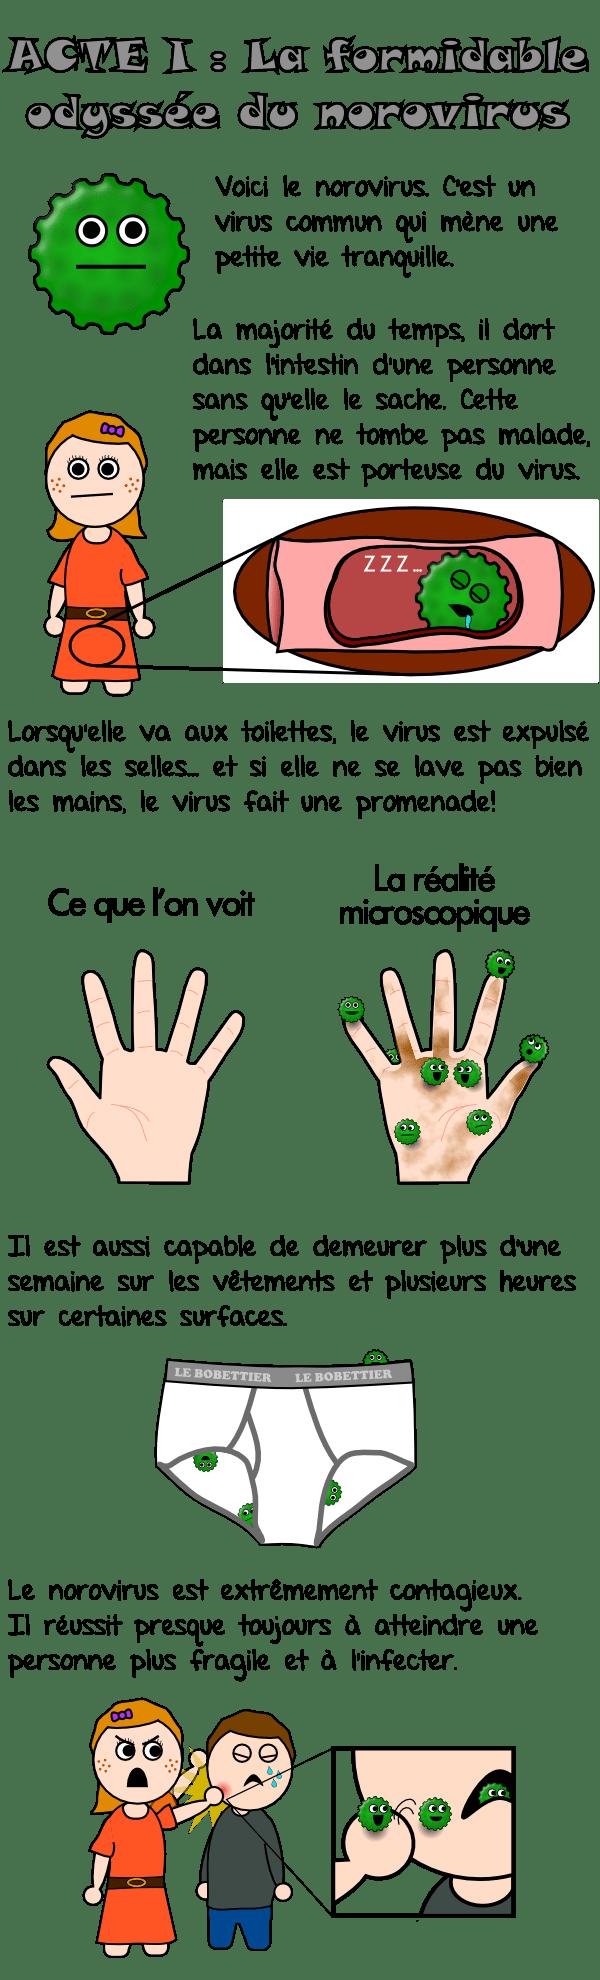 La formidable odyssée du norovirus (1)